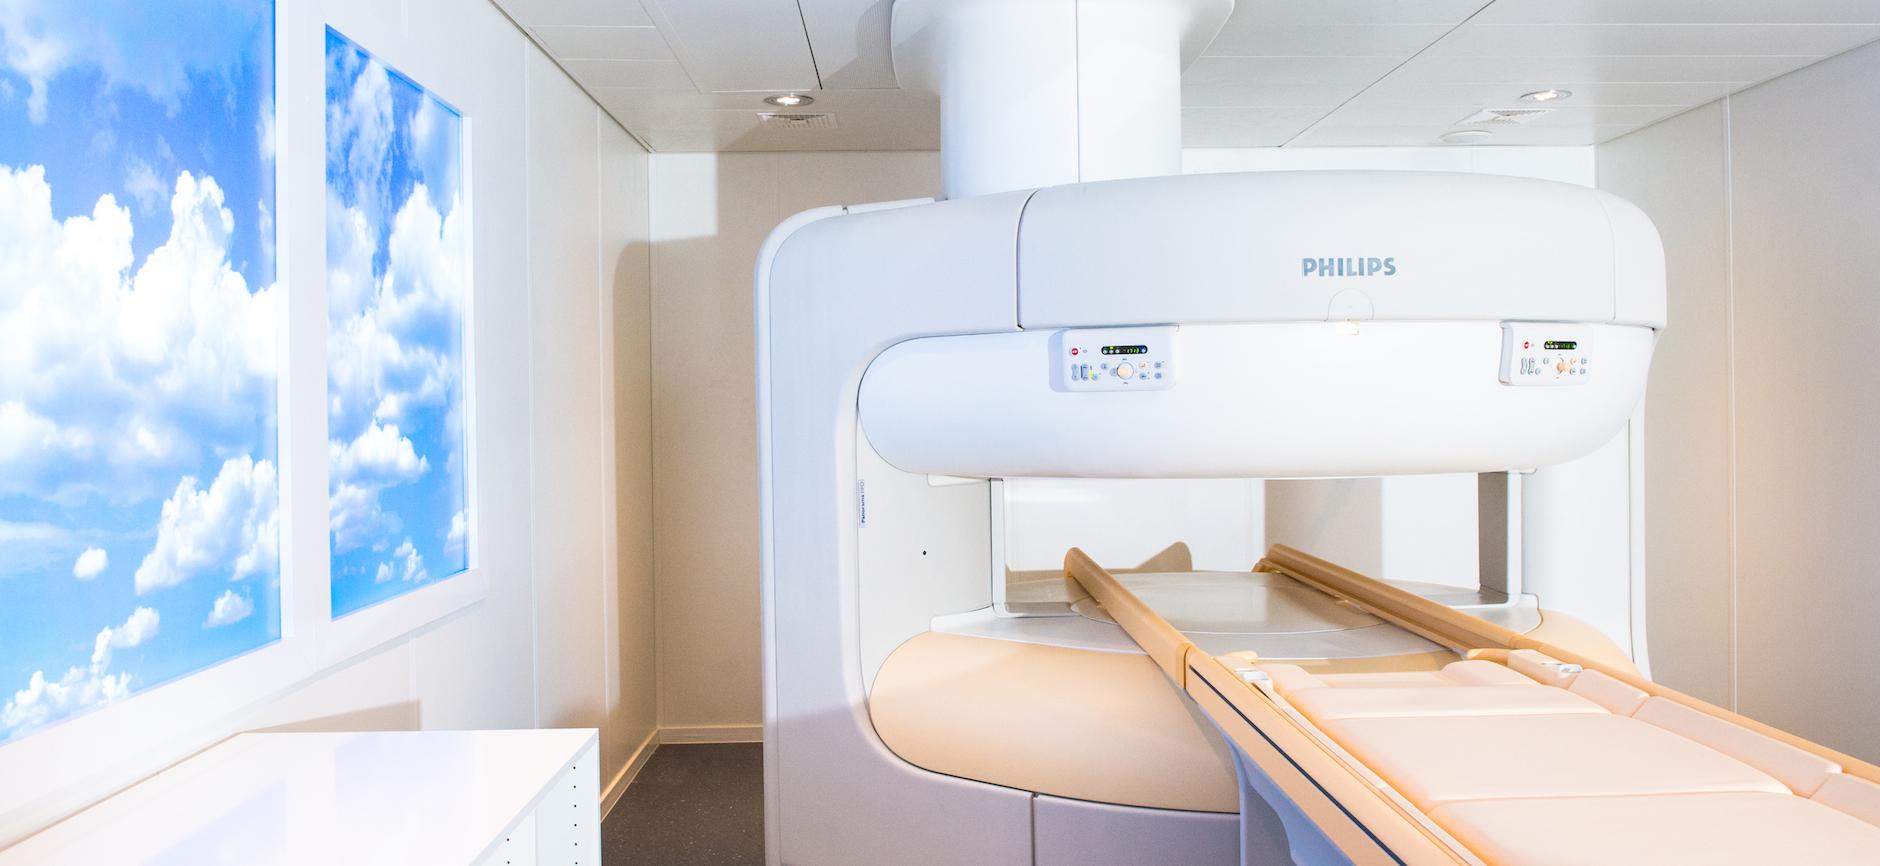 radiologe duisburg